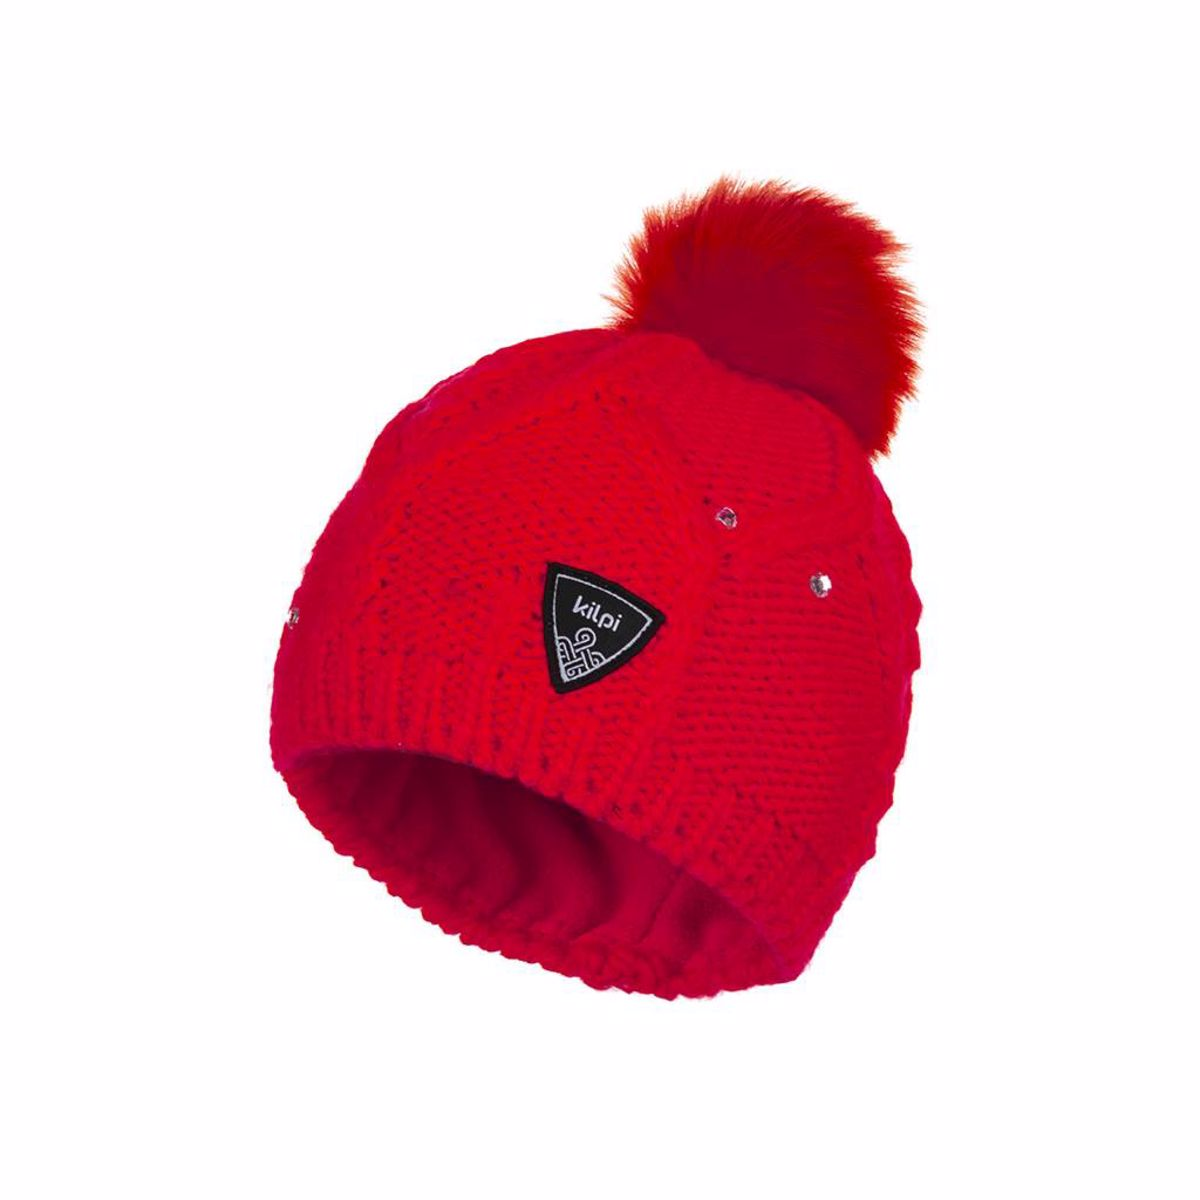 01728f8bc KILPI LADY-JG - dievčenská pletená čiapka | VeredaSport.sk